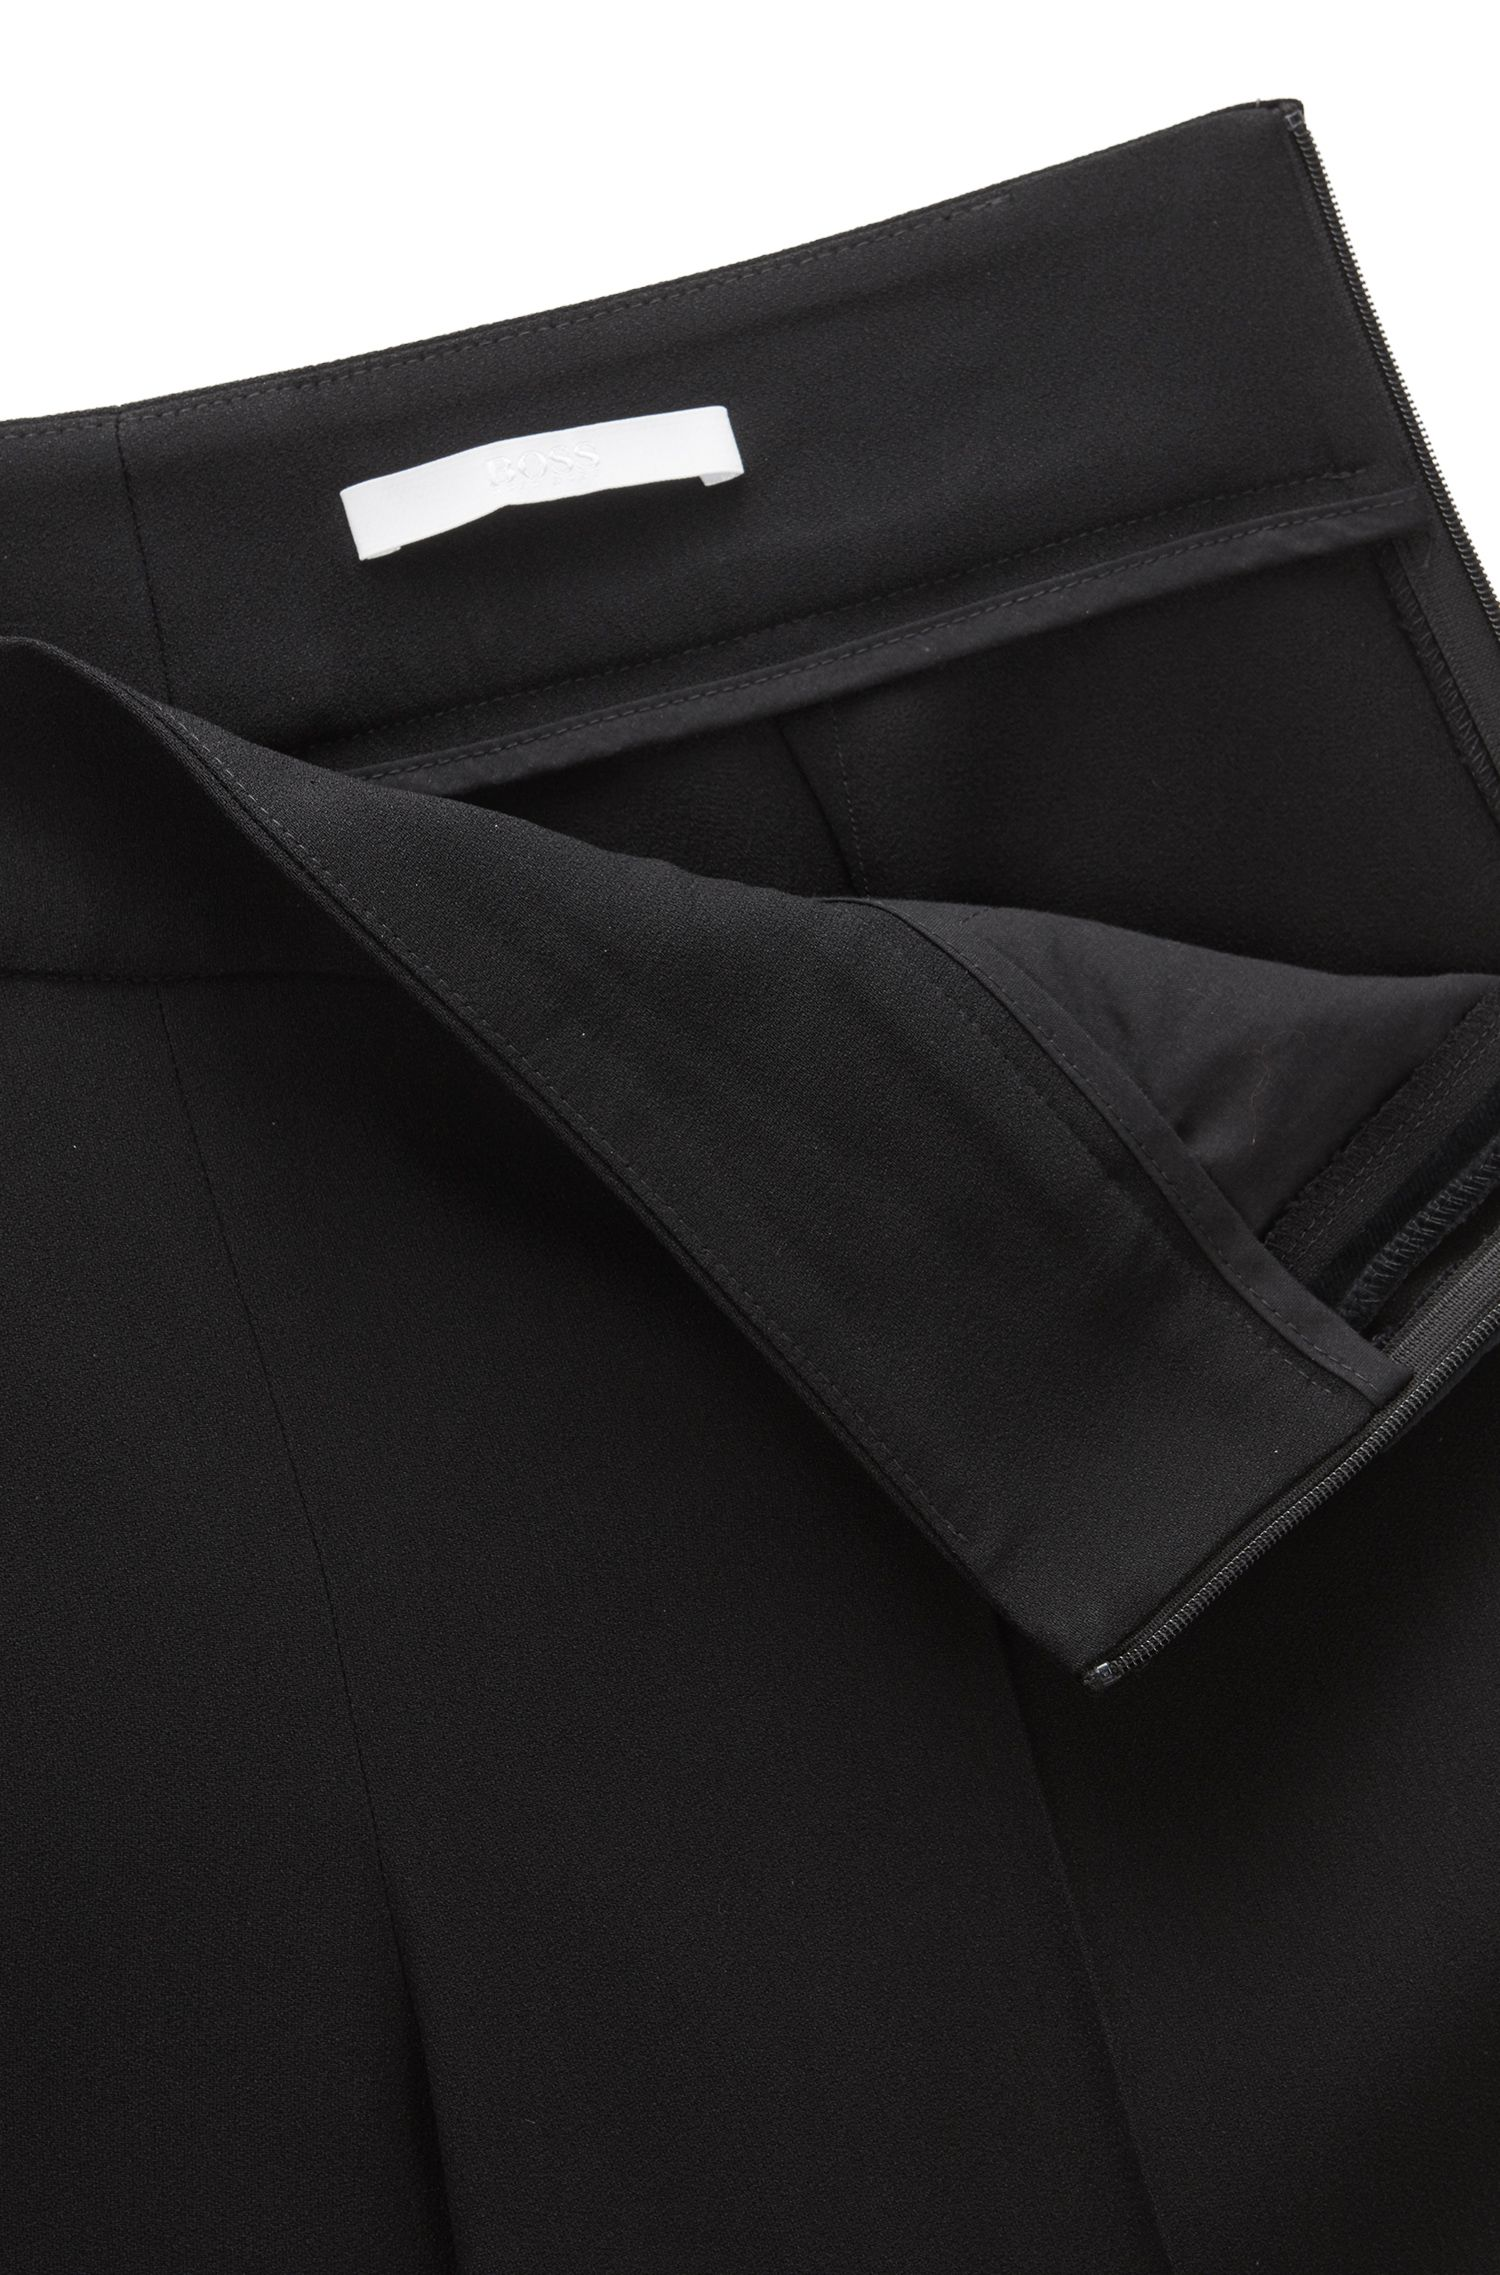 Stretch Viscose Cropped Tuxedo Pant | Tonalia